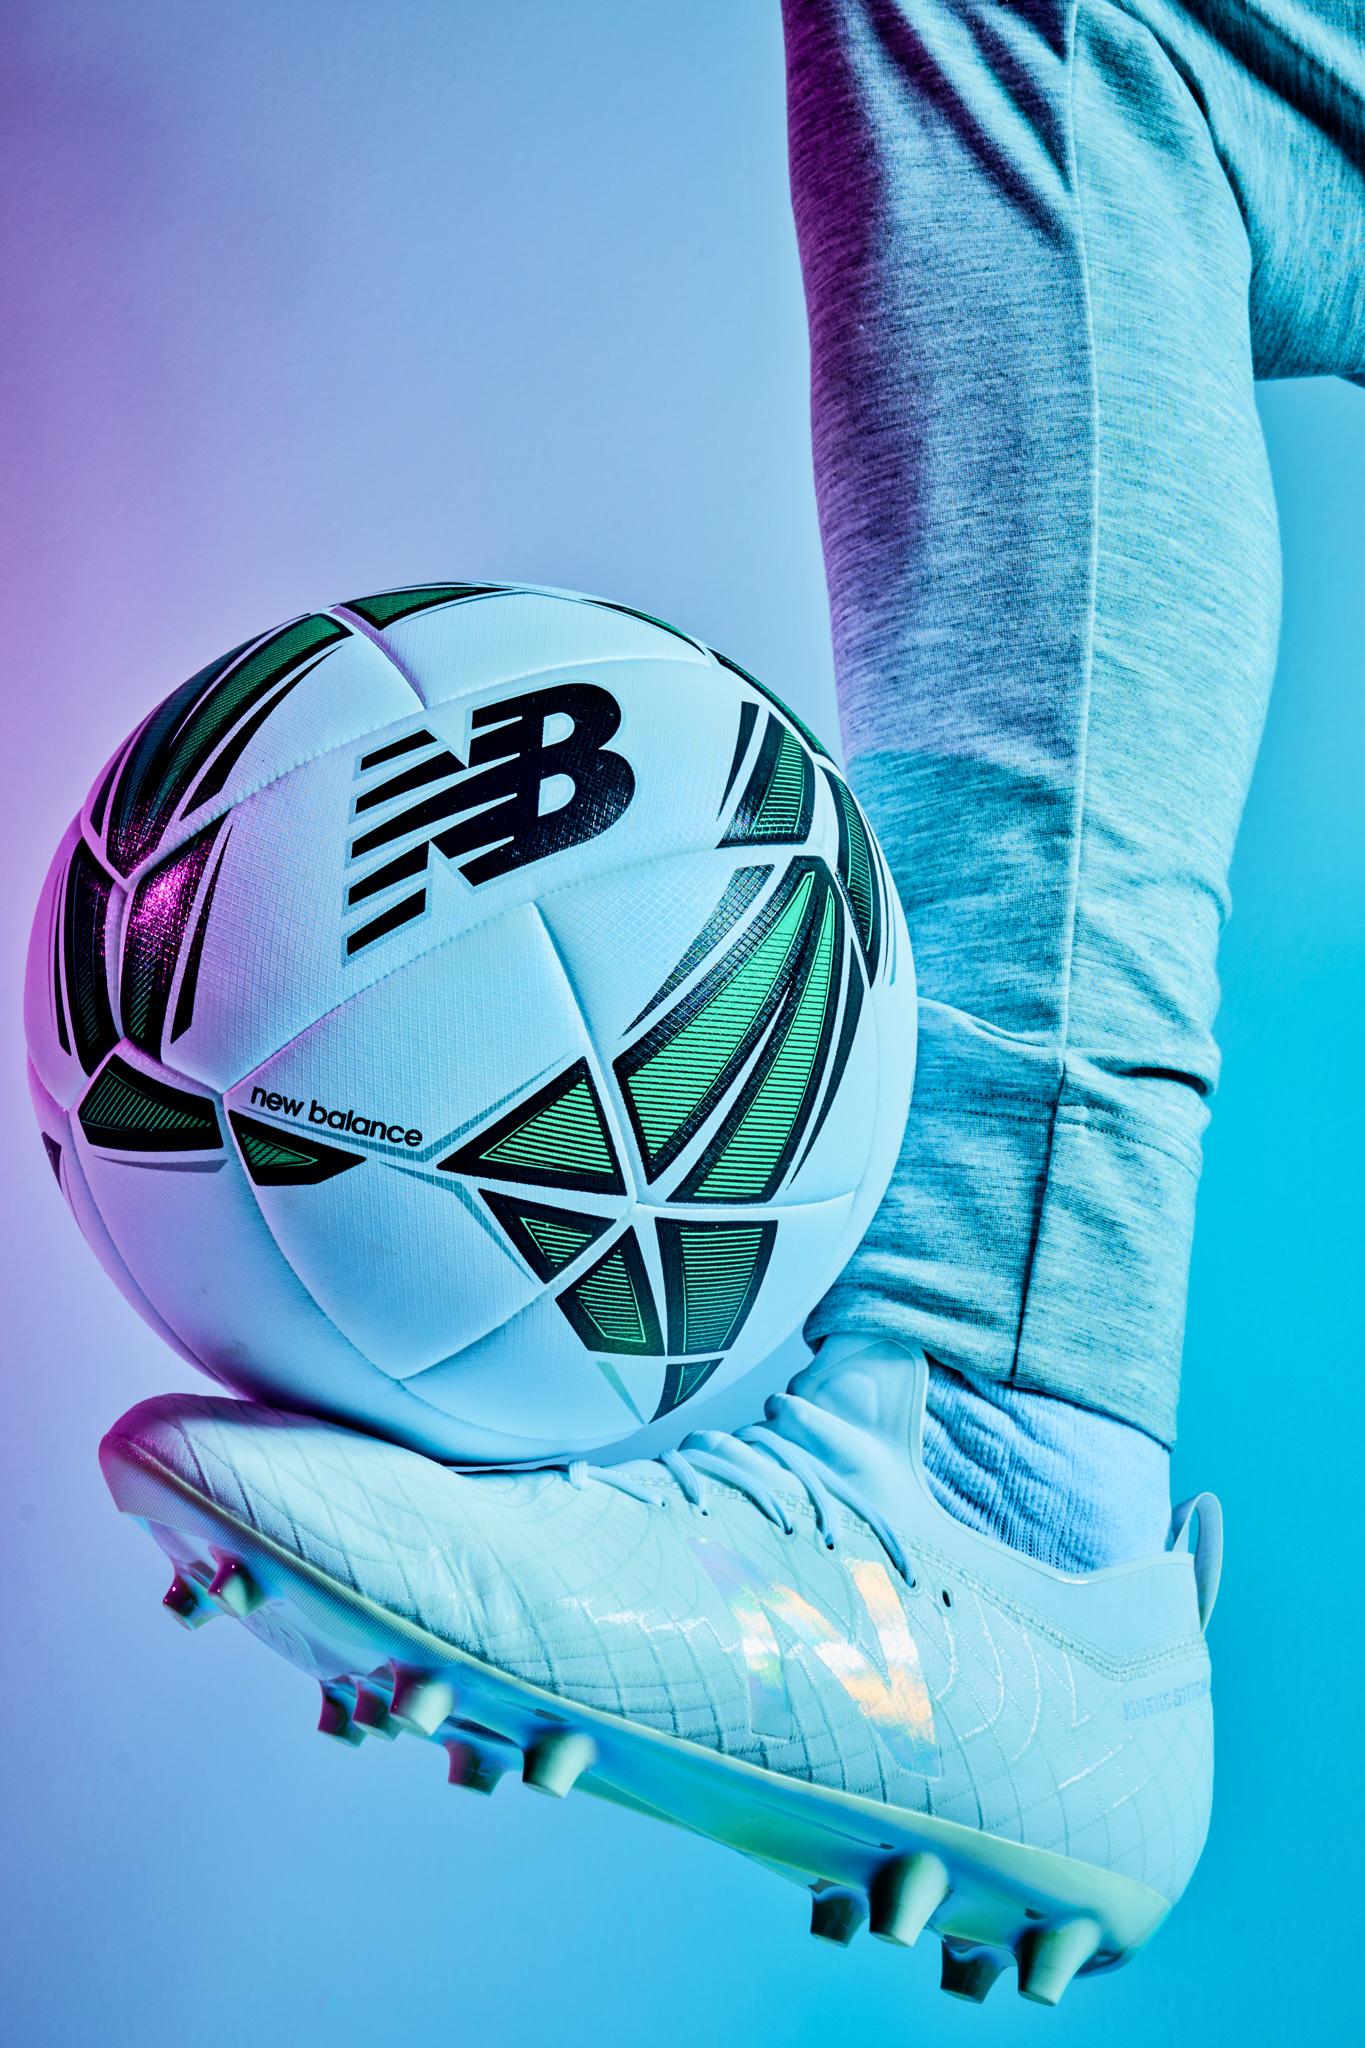 newbalance_football_-923.jpg